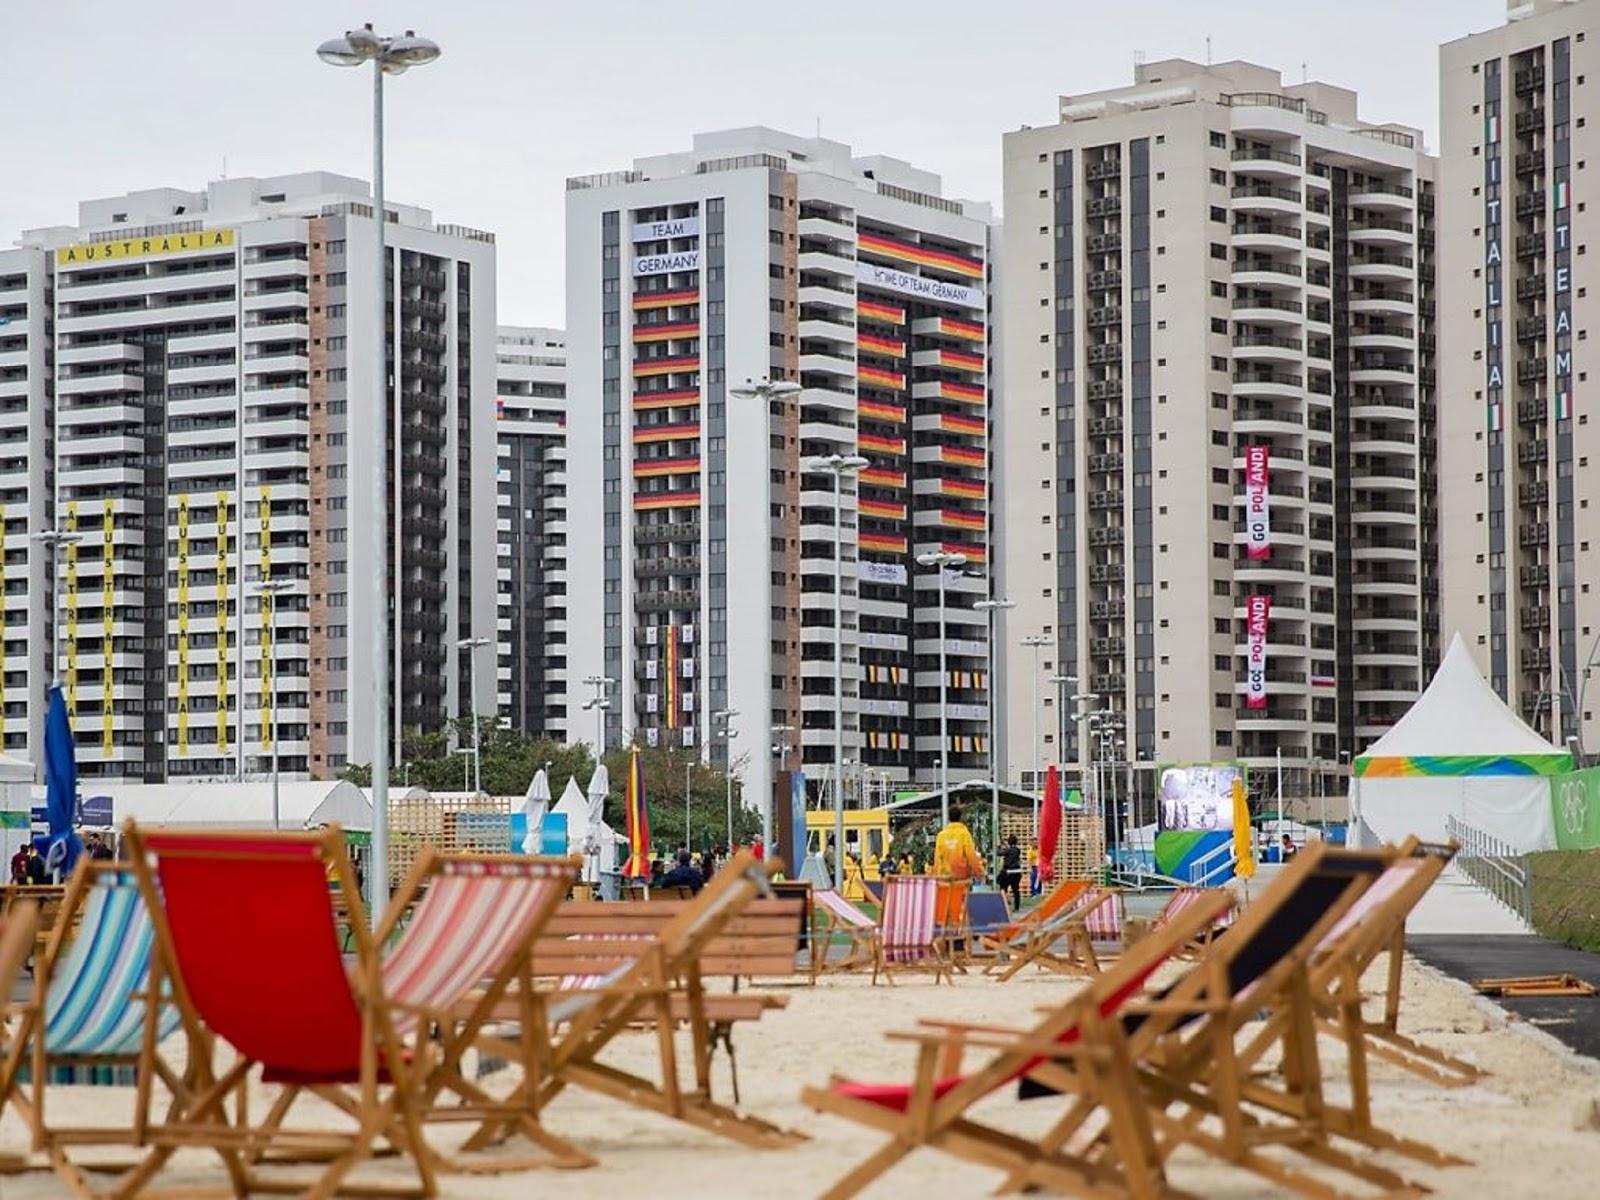 OLYMPIC VILLAGE, RIO OLYMPICS 2016 C